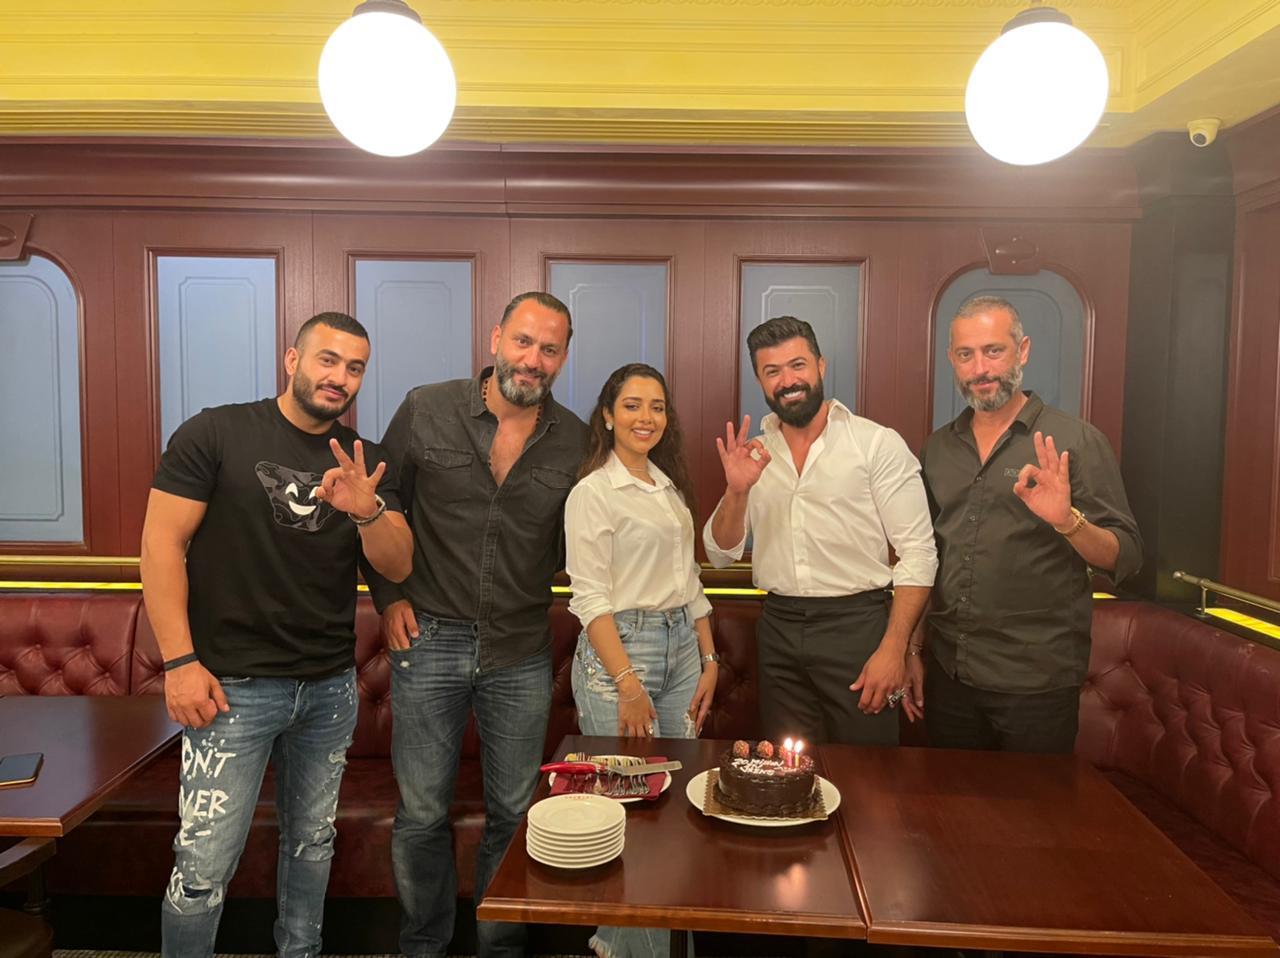 سيف نبيل وبلقيس فتحي يحتفلان بالـ 20 مليون!